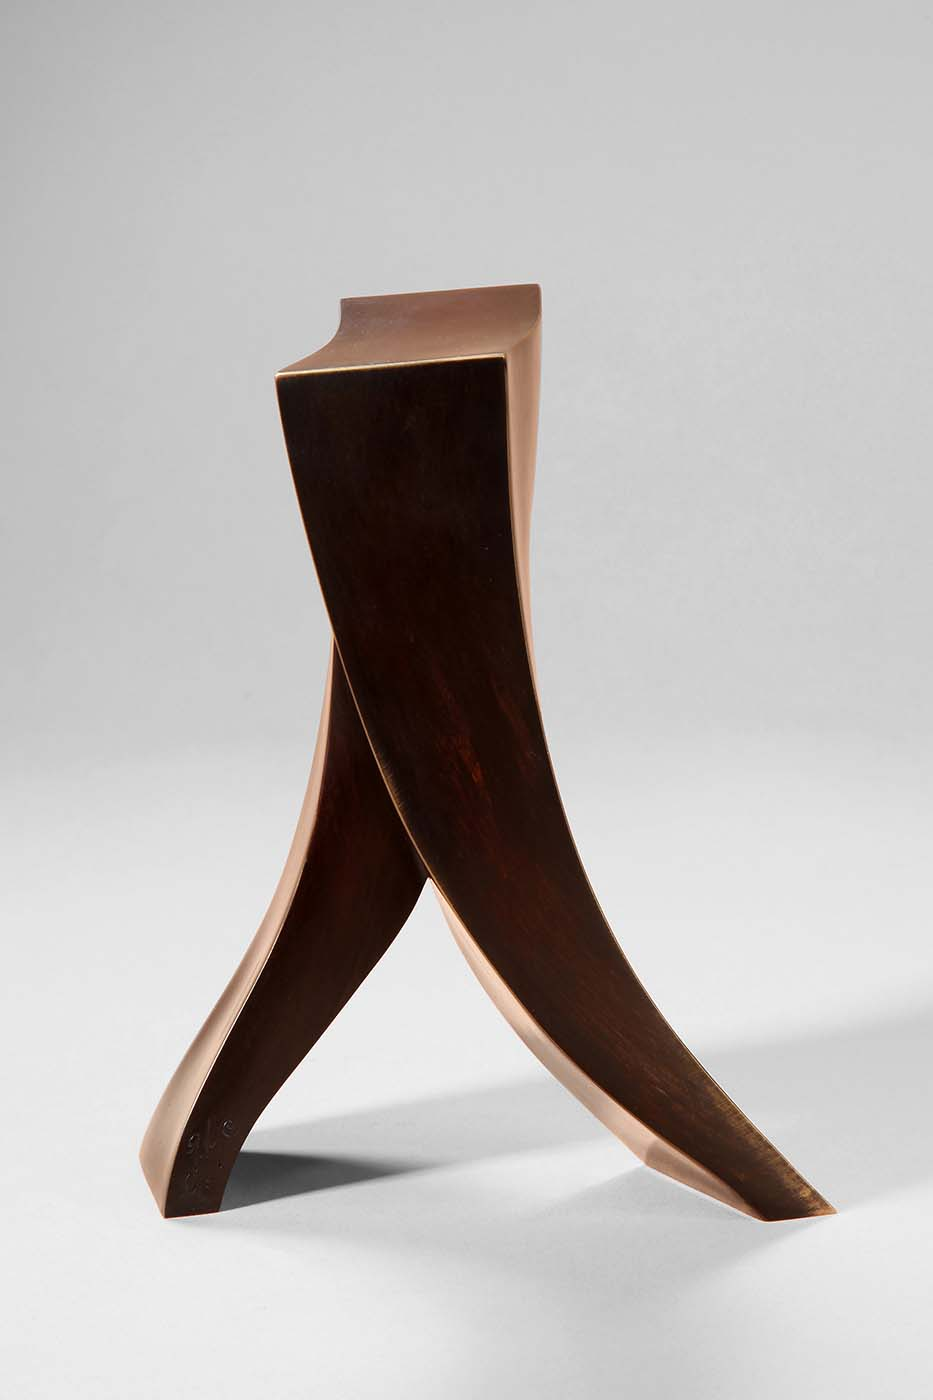 Schritt zum Erfolg, 2011, Bronze, 18,5 x 16 x 9 cm (02)